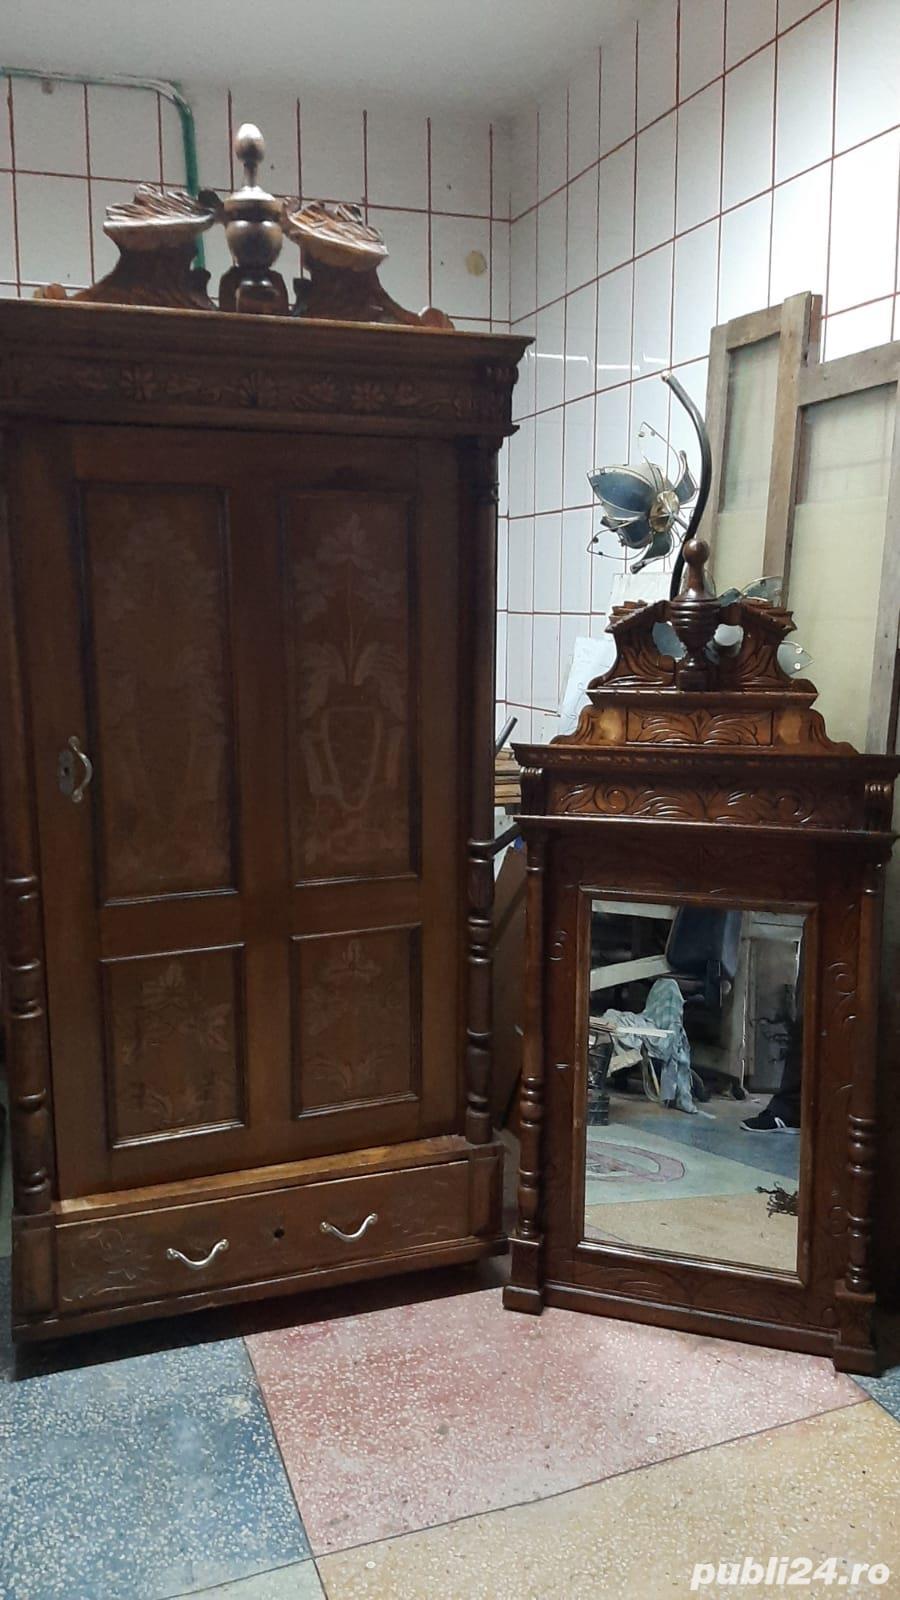 Vand sifonier si oglinda stil baroc, cu sculpturi manuale, originale,  foarte bune - 150 ani vech.